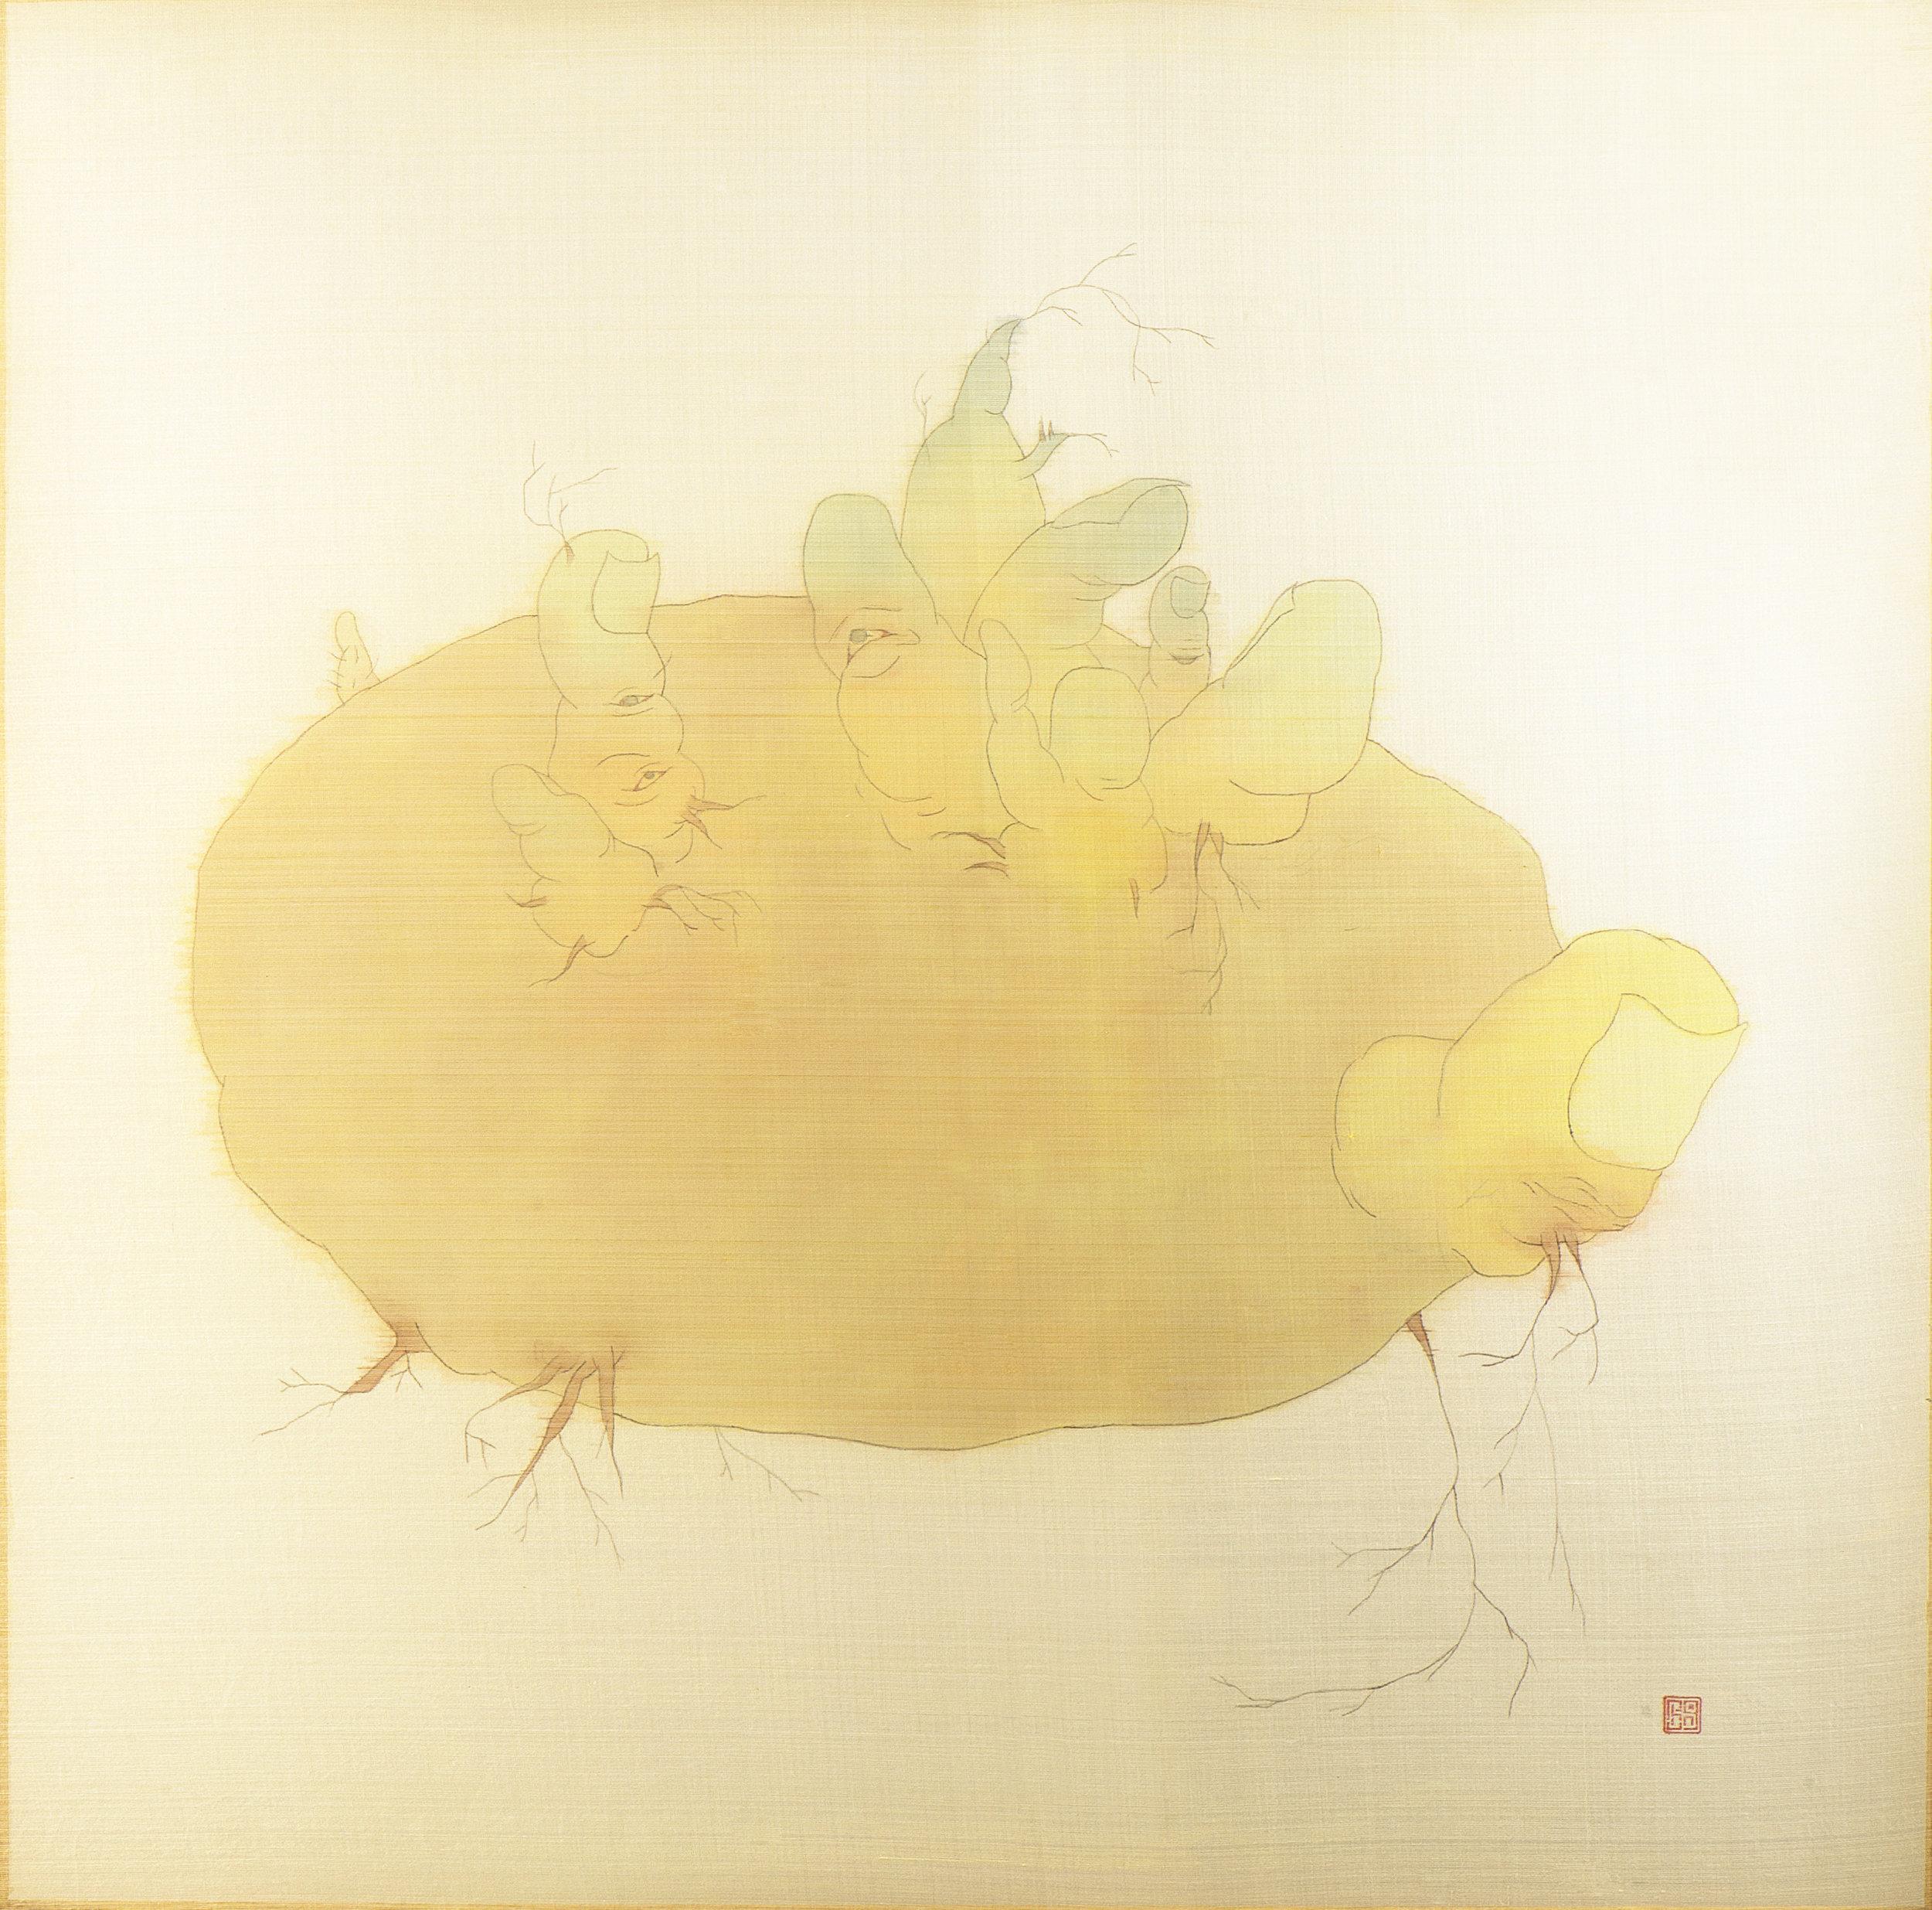 LE HOANG BICH PHUONG (1984)